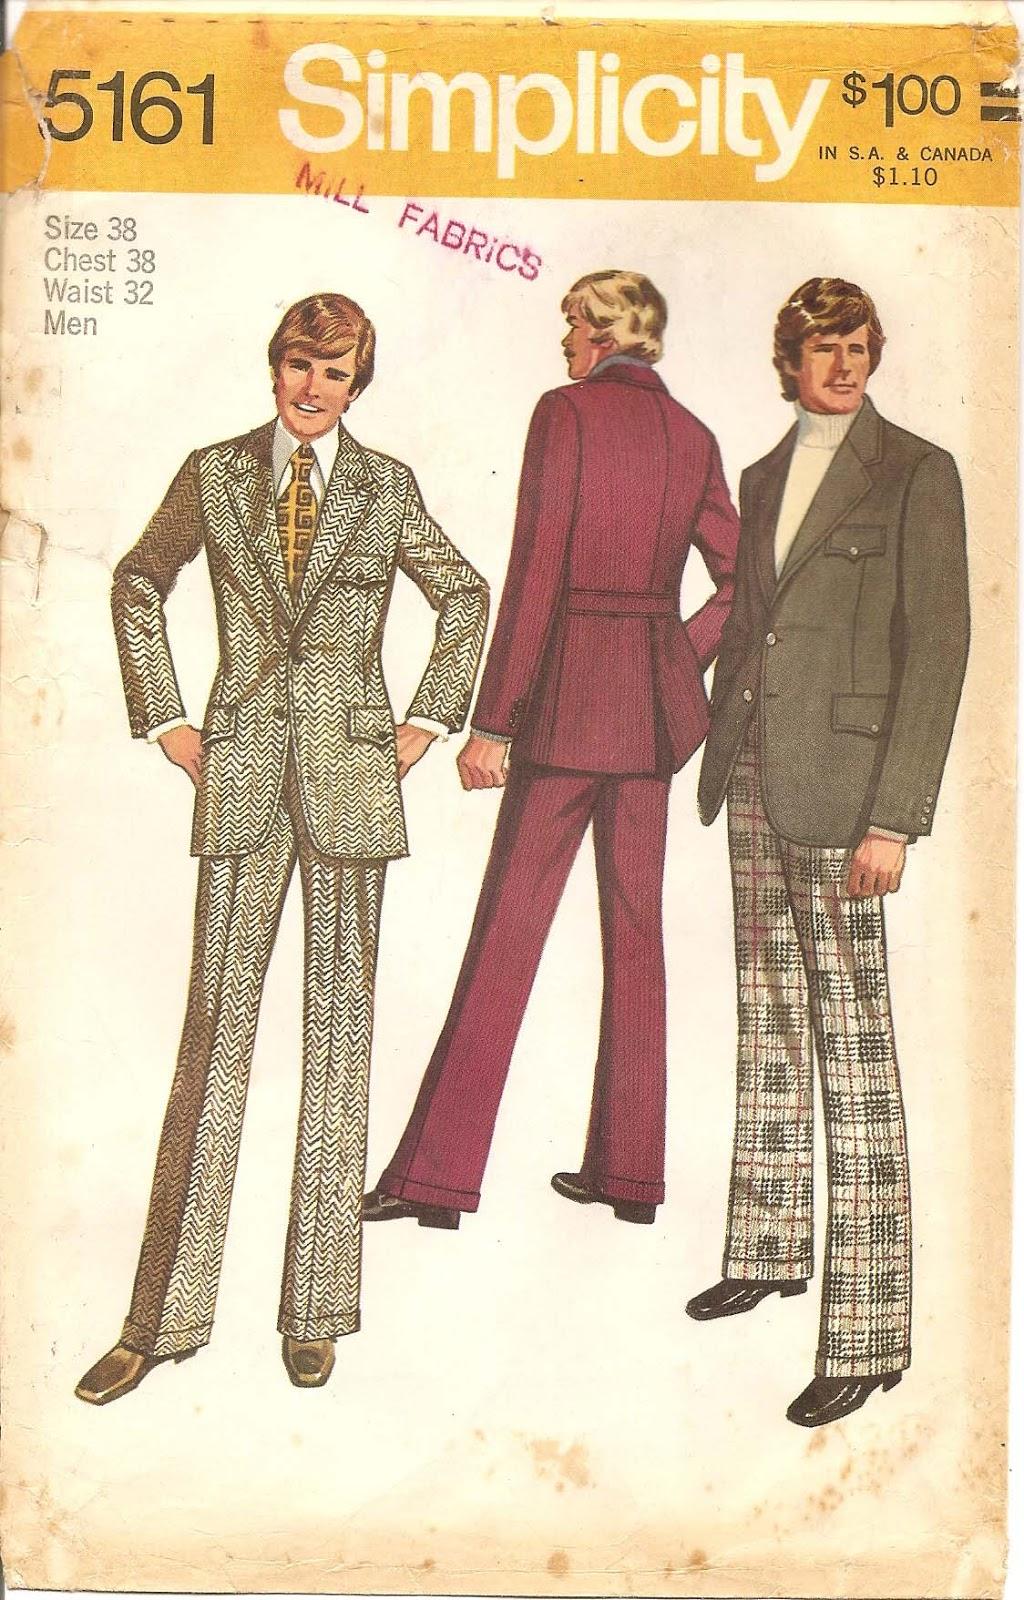 ct studios vintage 1970s mens sewing patterns a stroll down memory lane. Black Bedroom Furniture Sets. Home Design Ideas